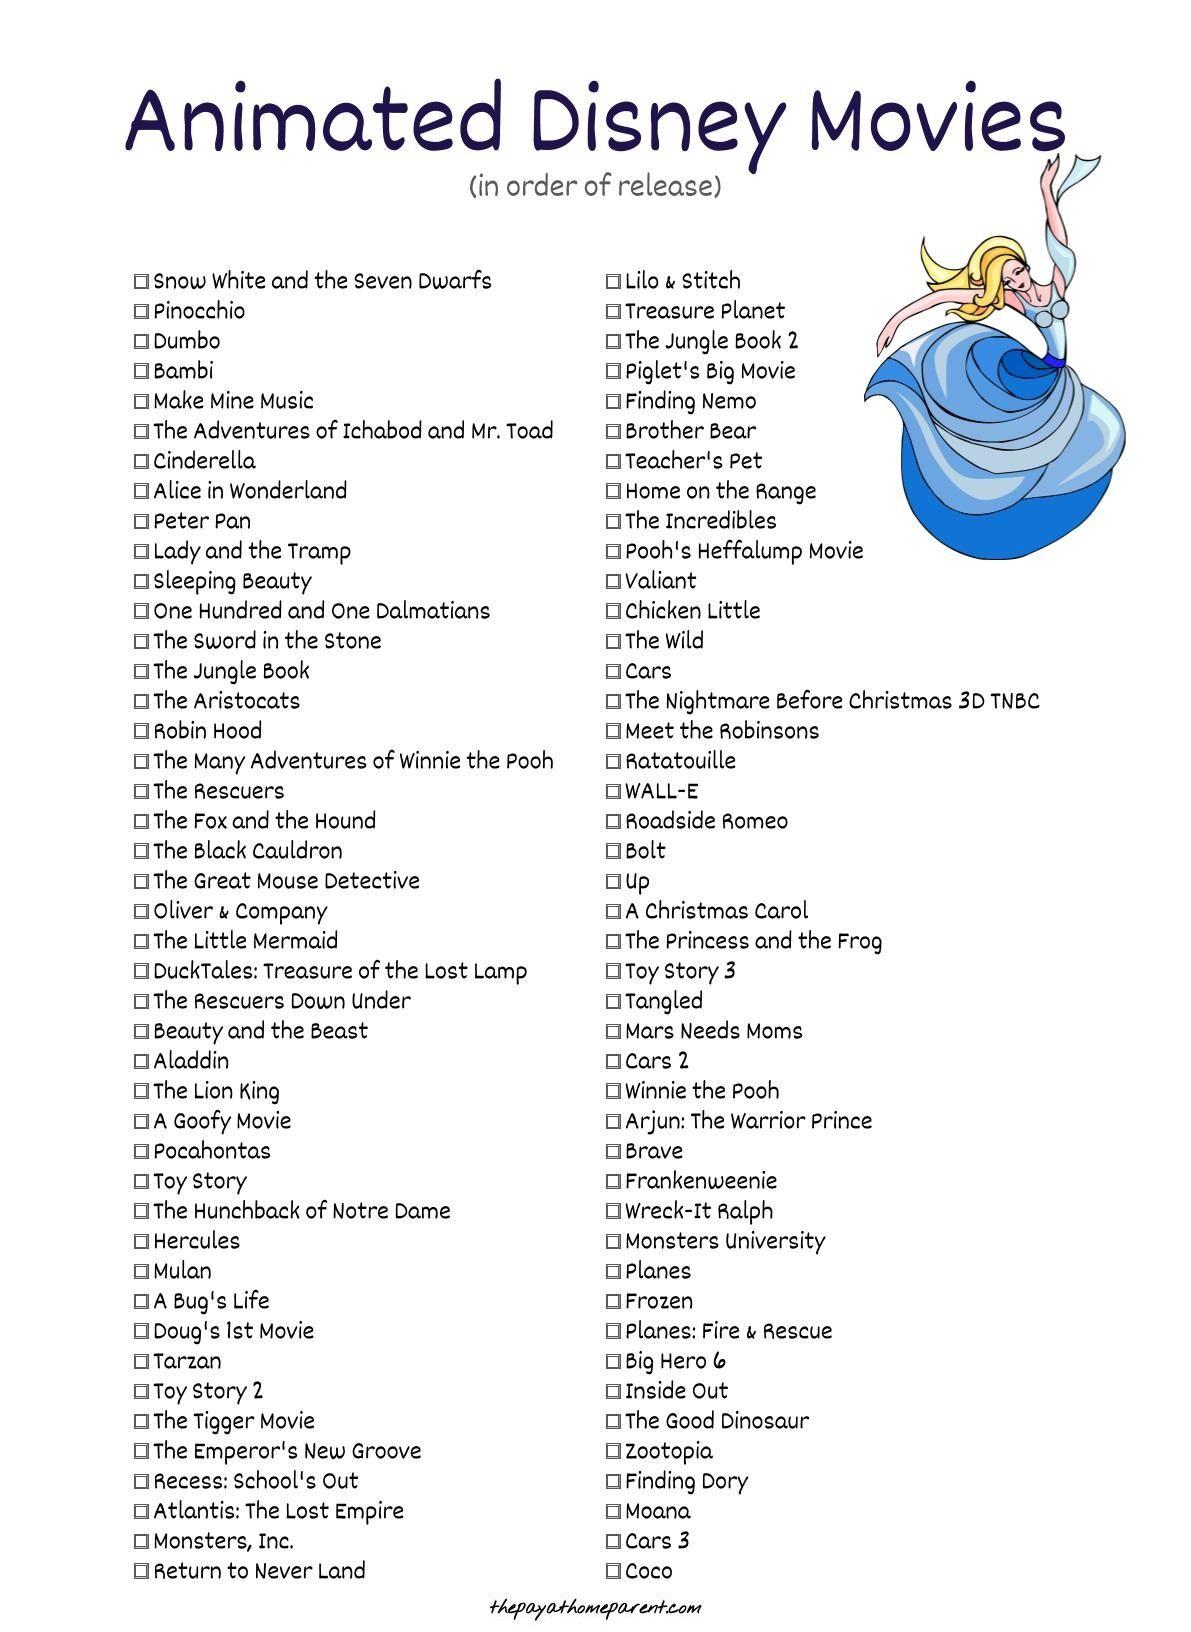 Disney Movies List Disney princess movies, Disney movies